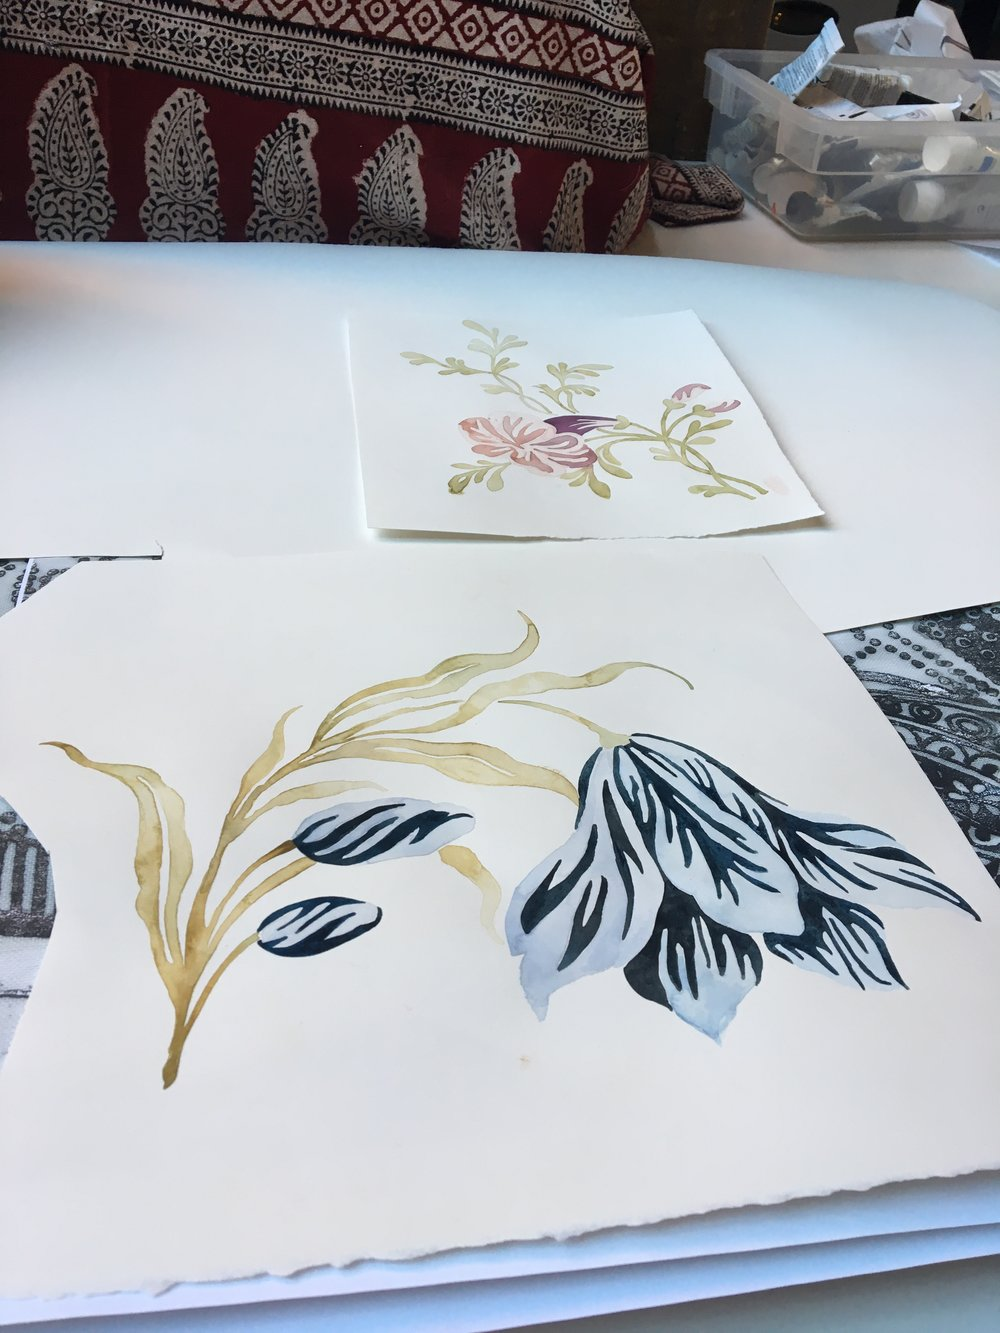 Watercolor Floral process 1